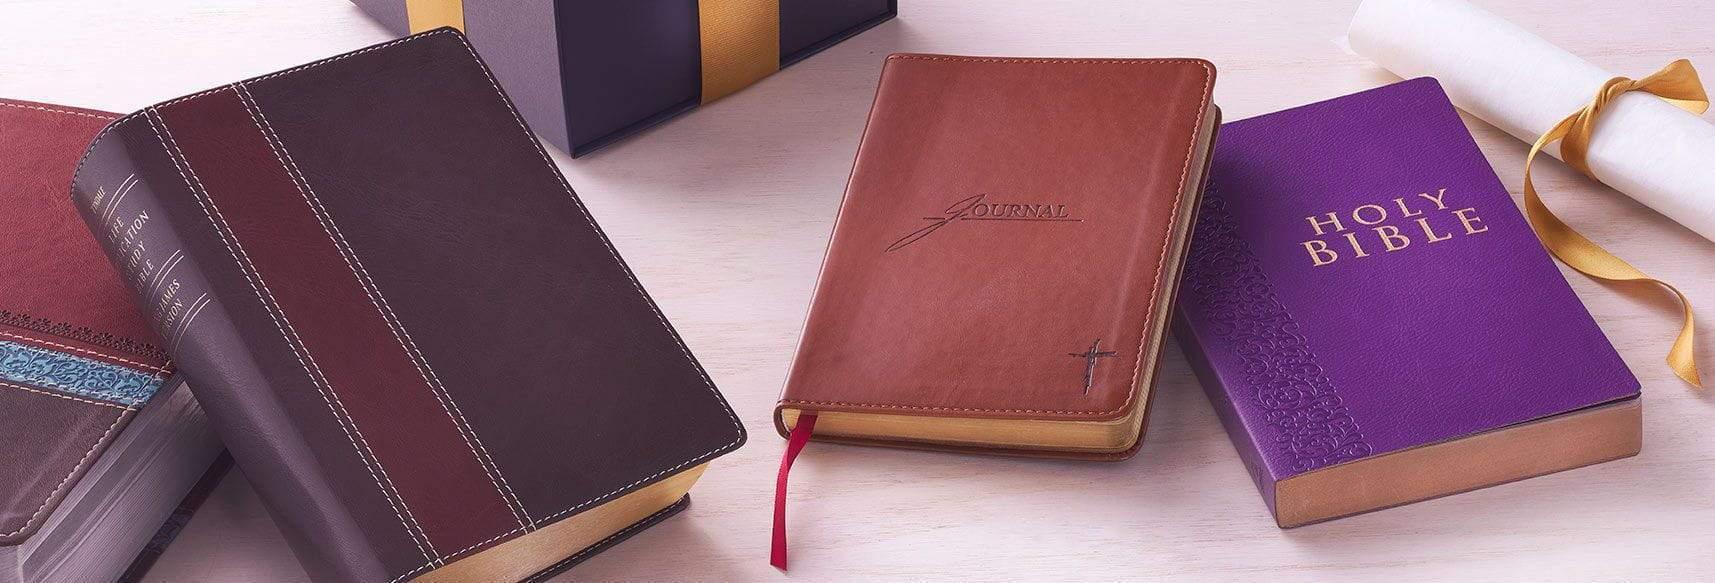 christian graduation gifts kjv